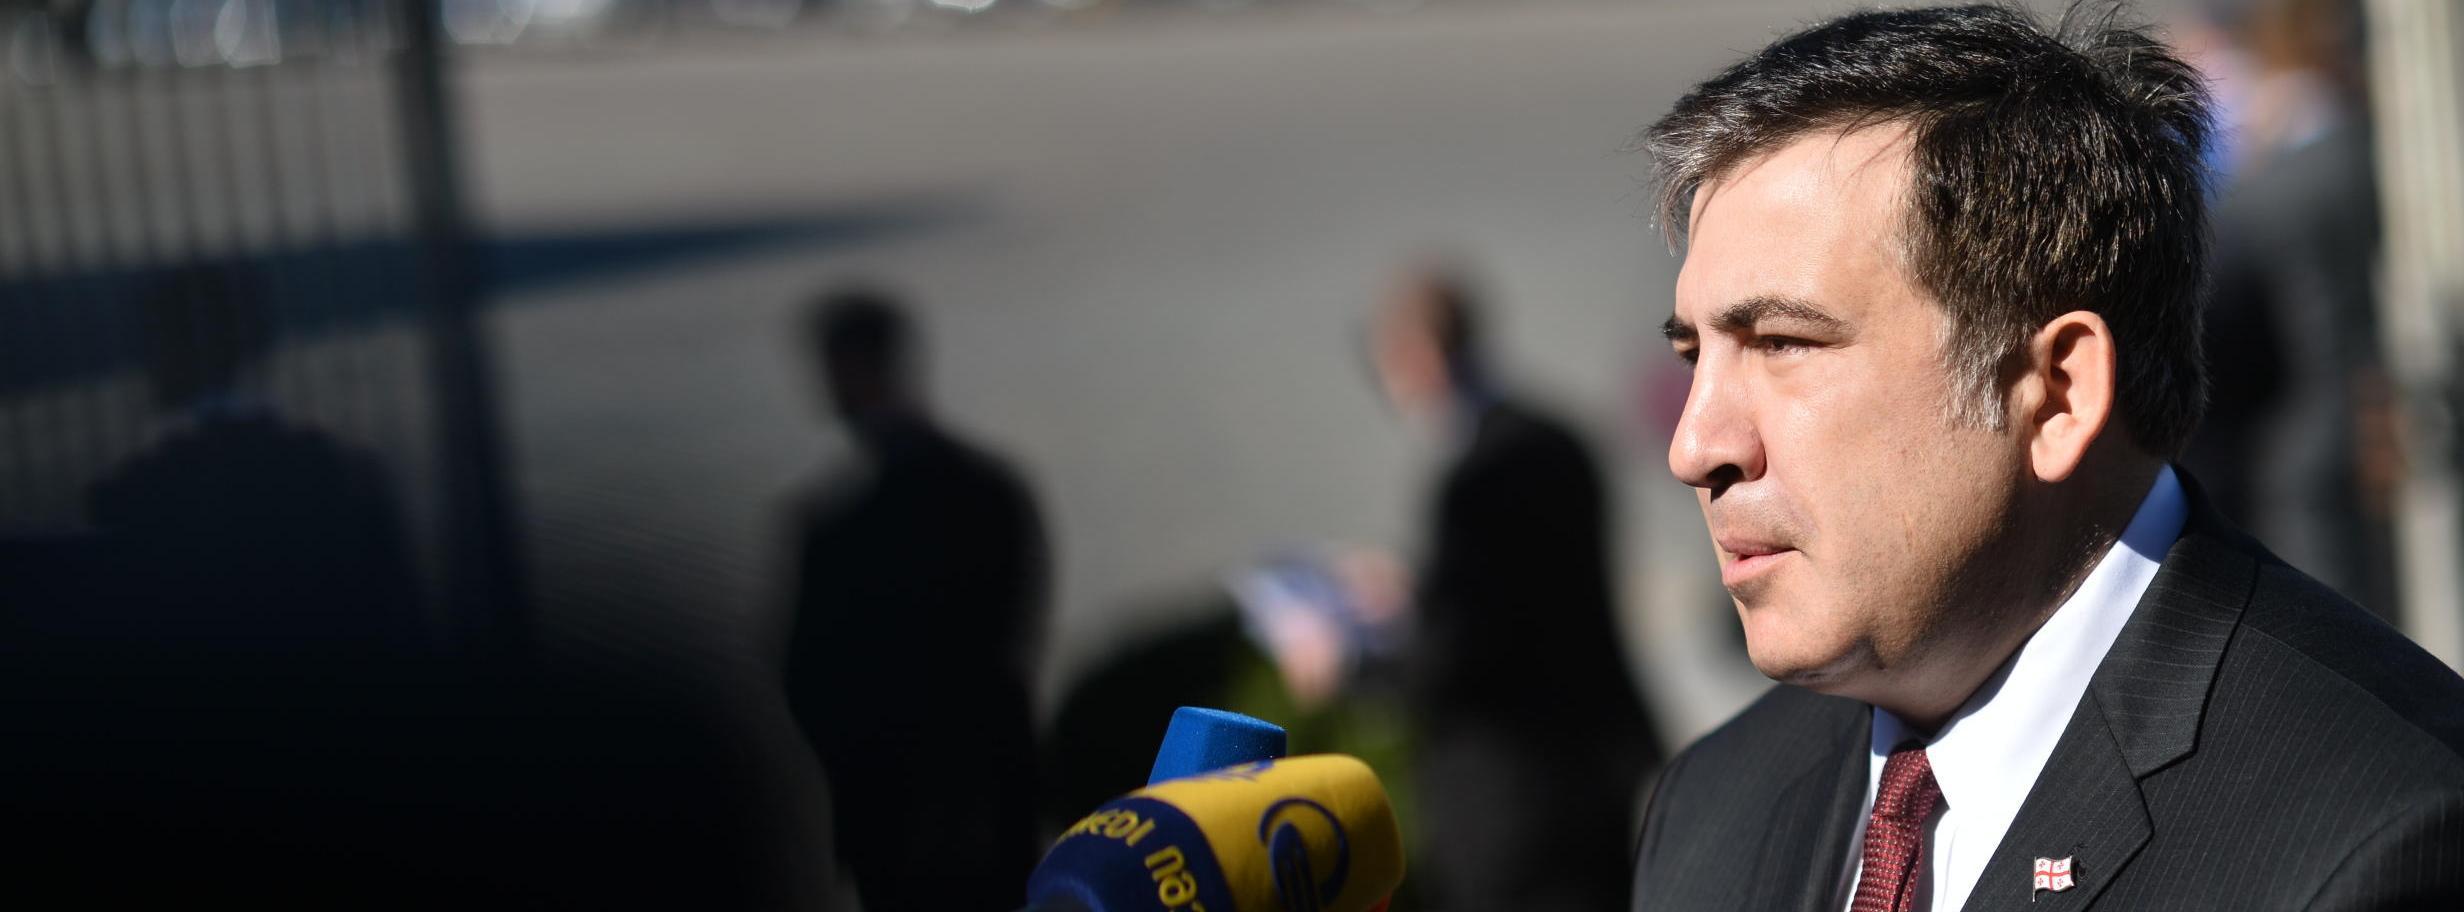 Сколько заработал бы Саакашвили на своем YouTube-канале?